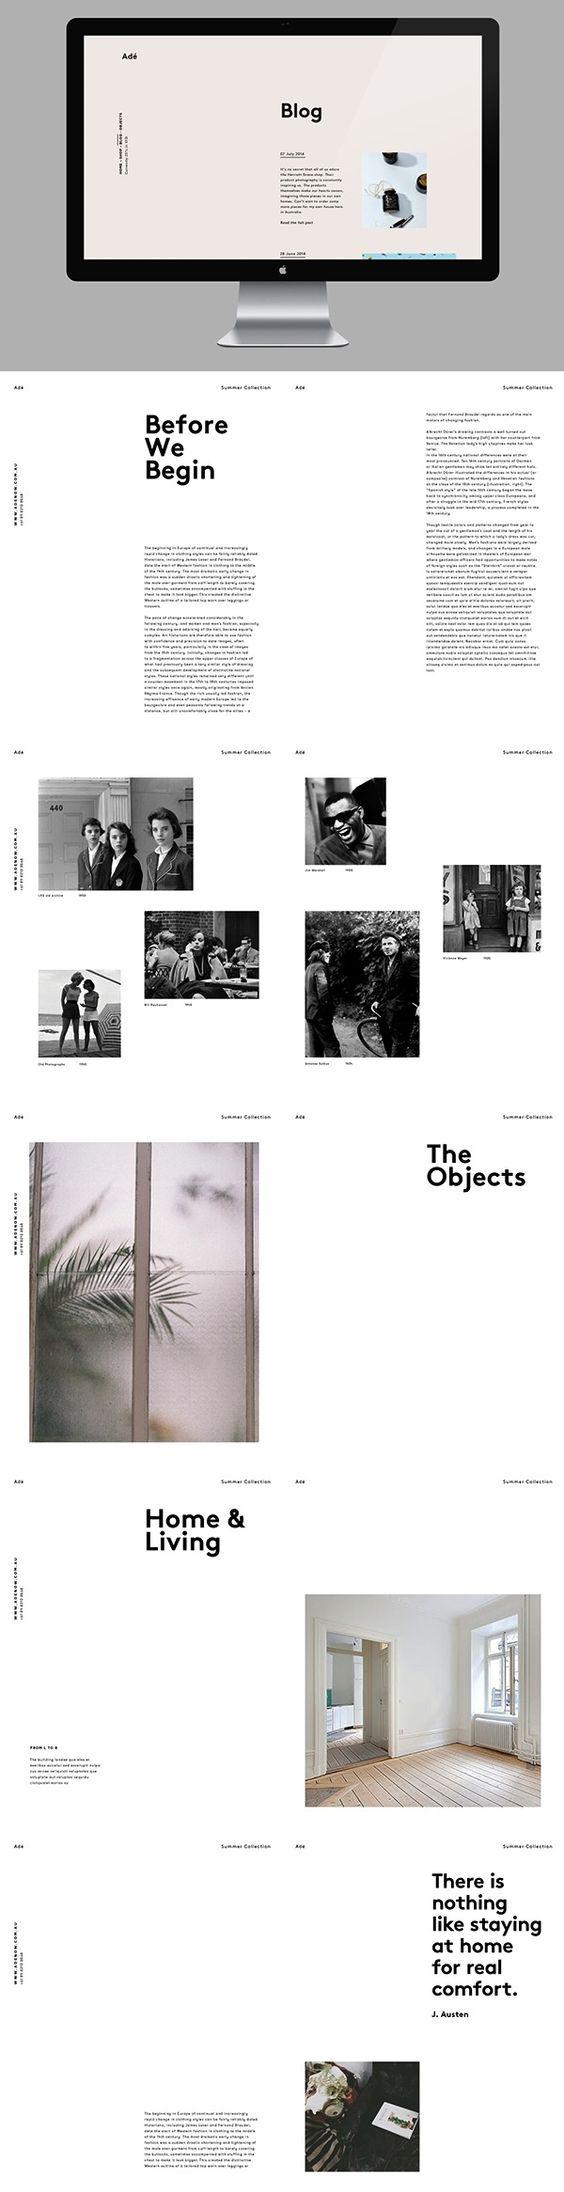 Adé blog web design   Editorial / Poster   Pinterest